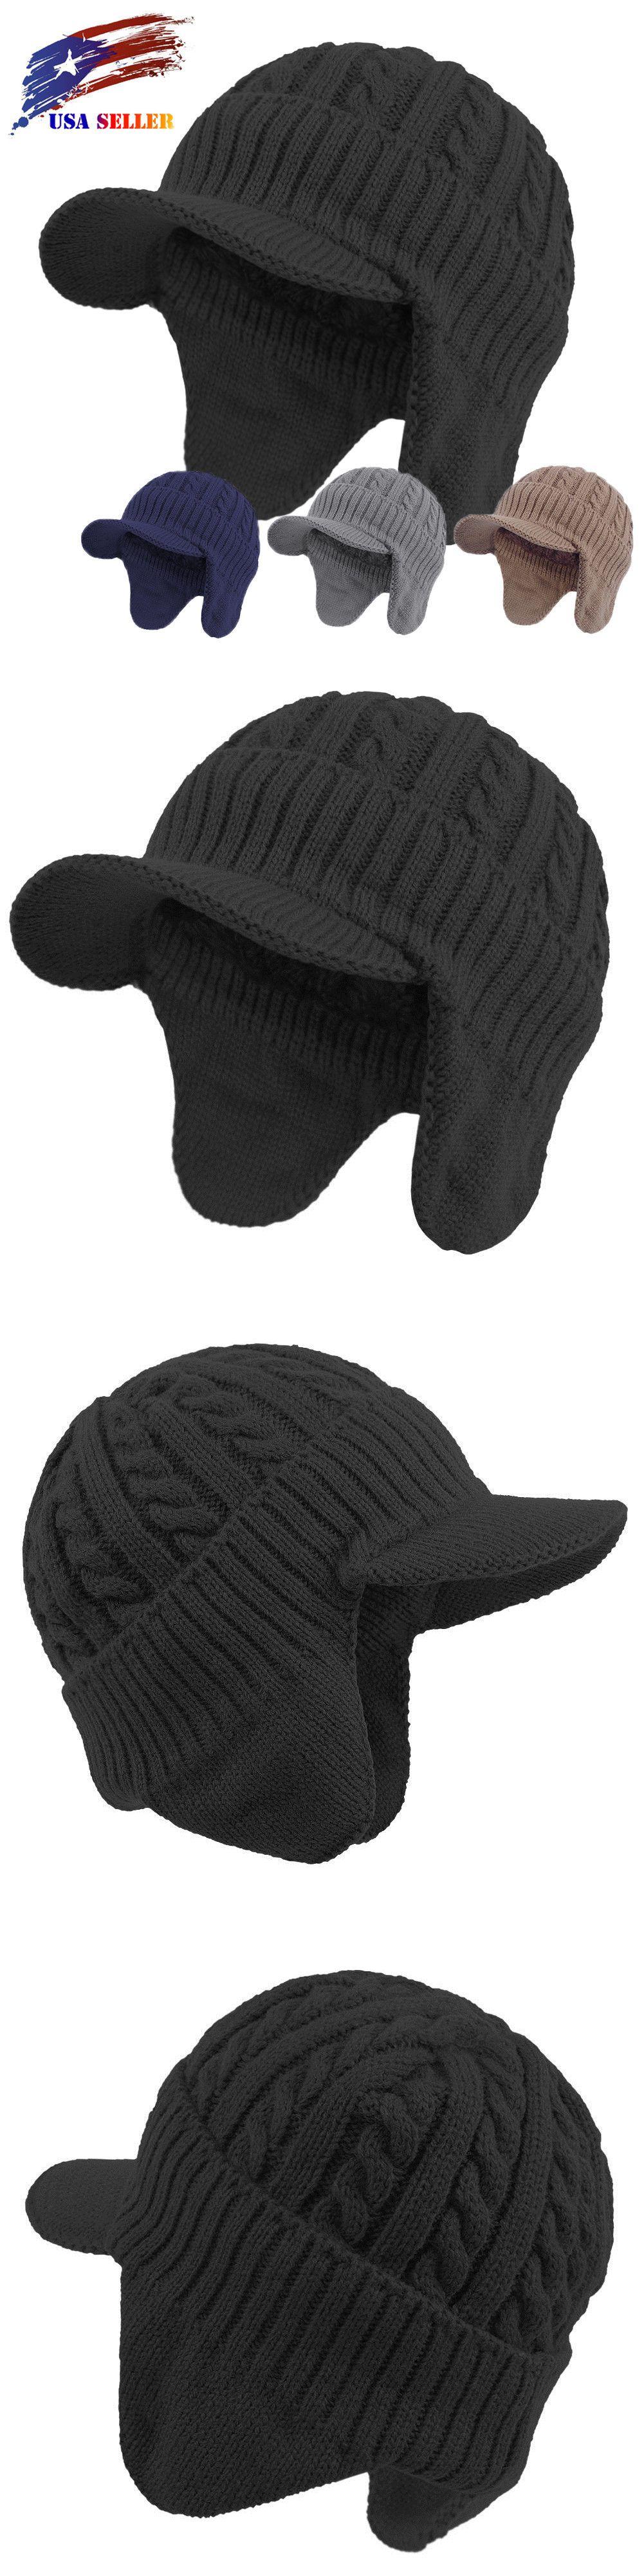 0dd1ffc62cef4 Hats and Headwear 62175  Winter Earflaps Visor Beanie Knit Brim Hat Warm  Fleece Lined Ski